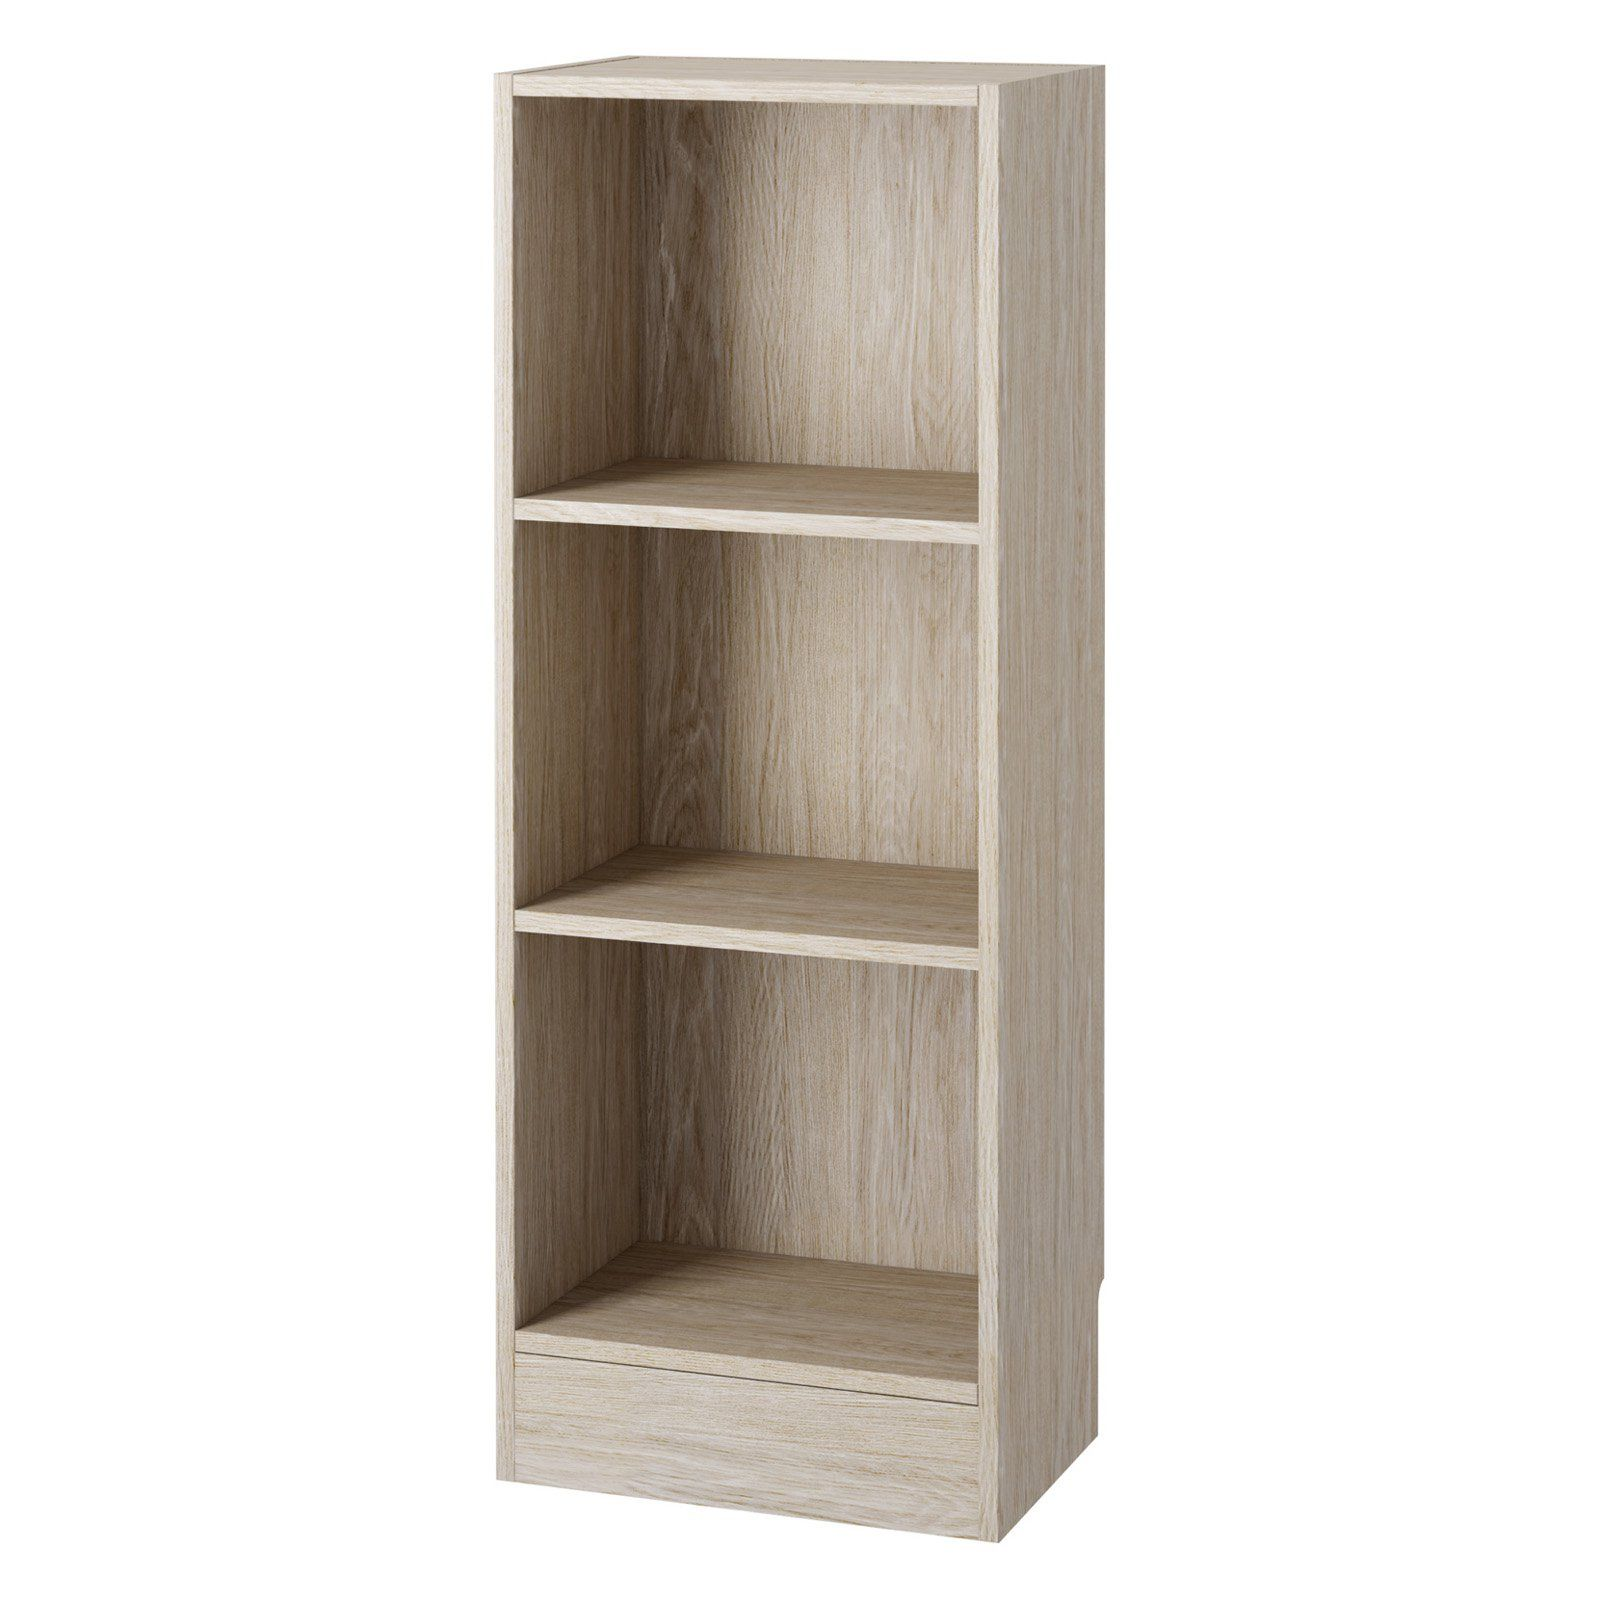 Tvilum Element Short Bookcase 3 Shelf Bookcase Bookcase Shelves